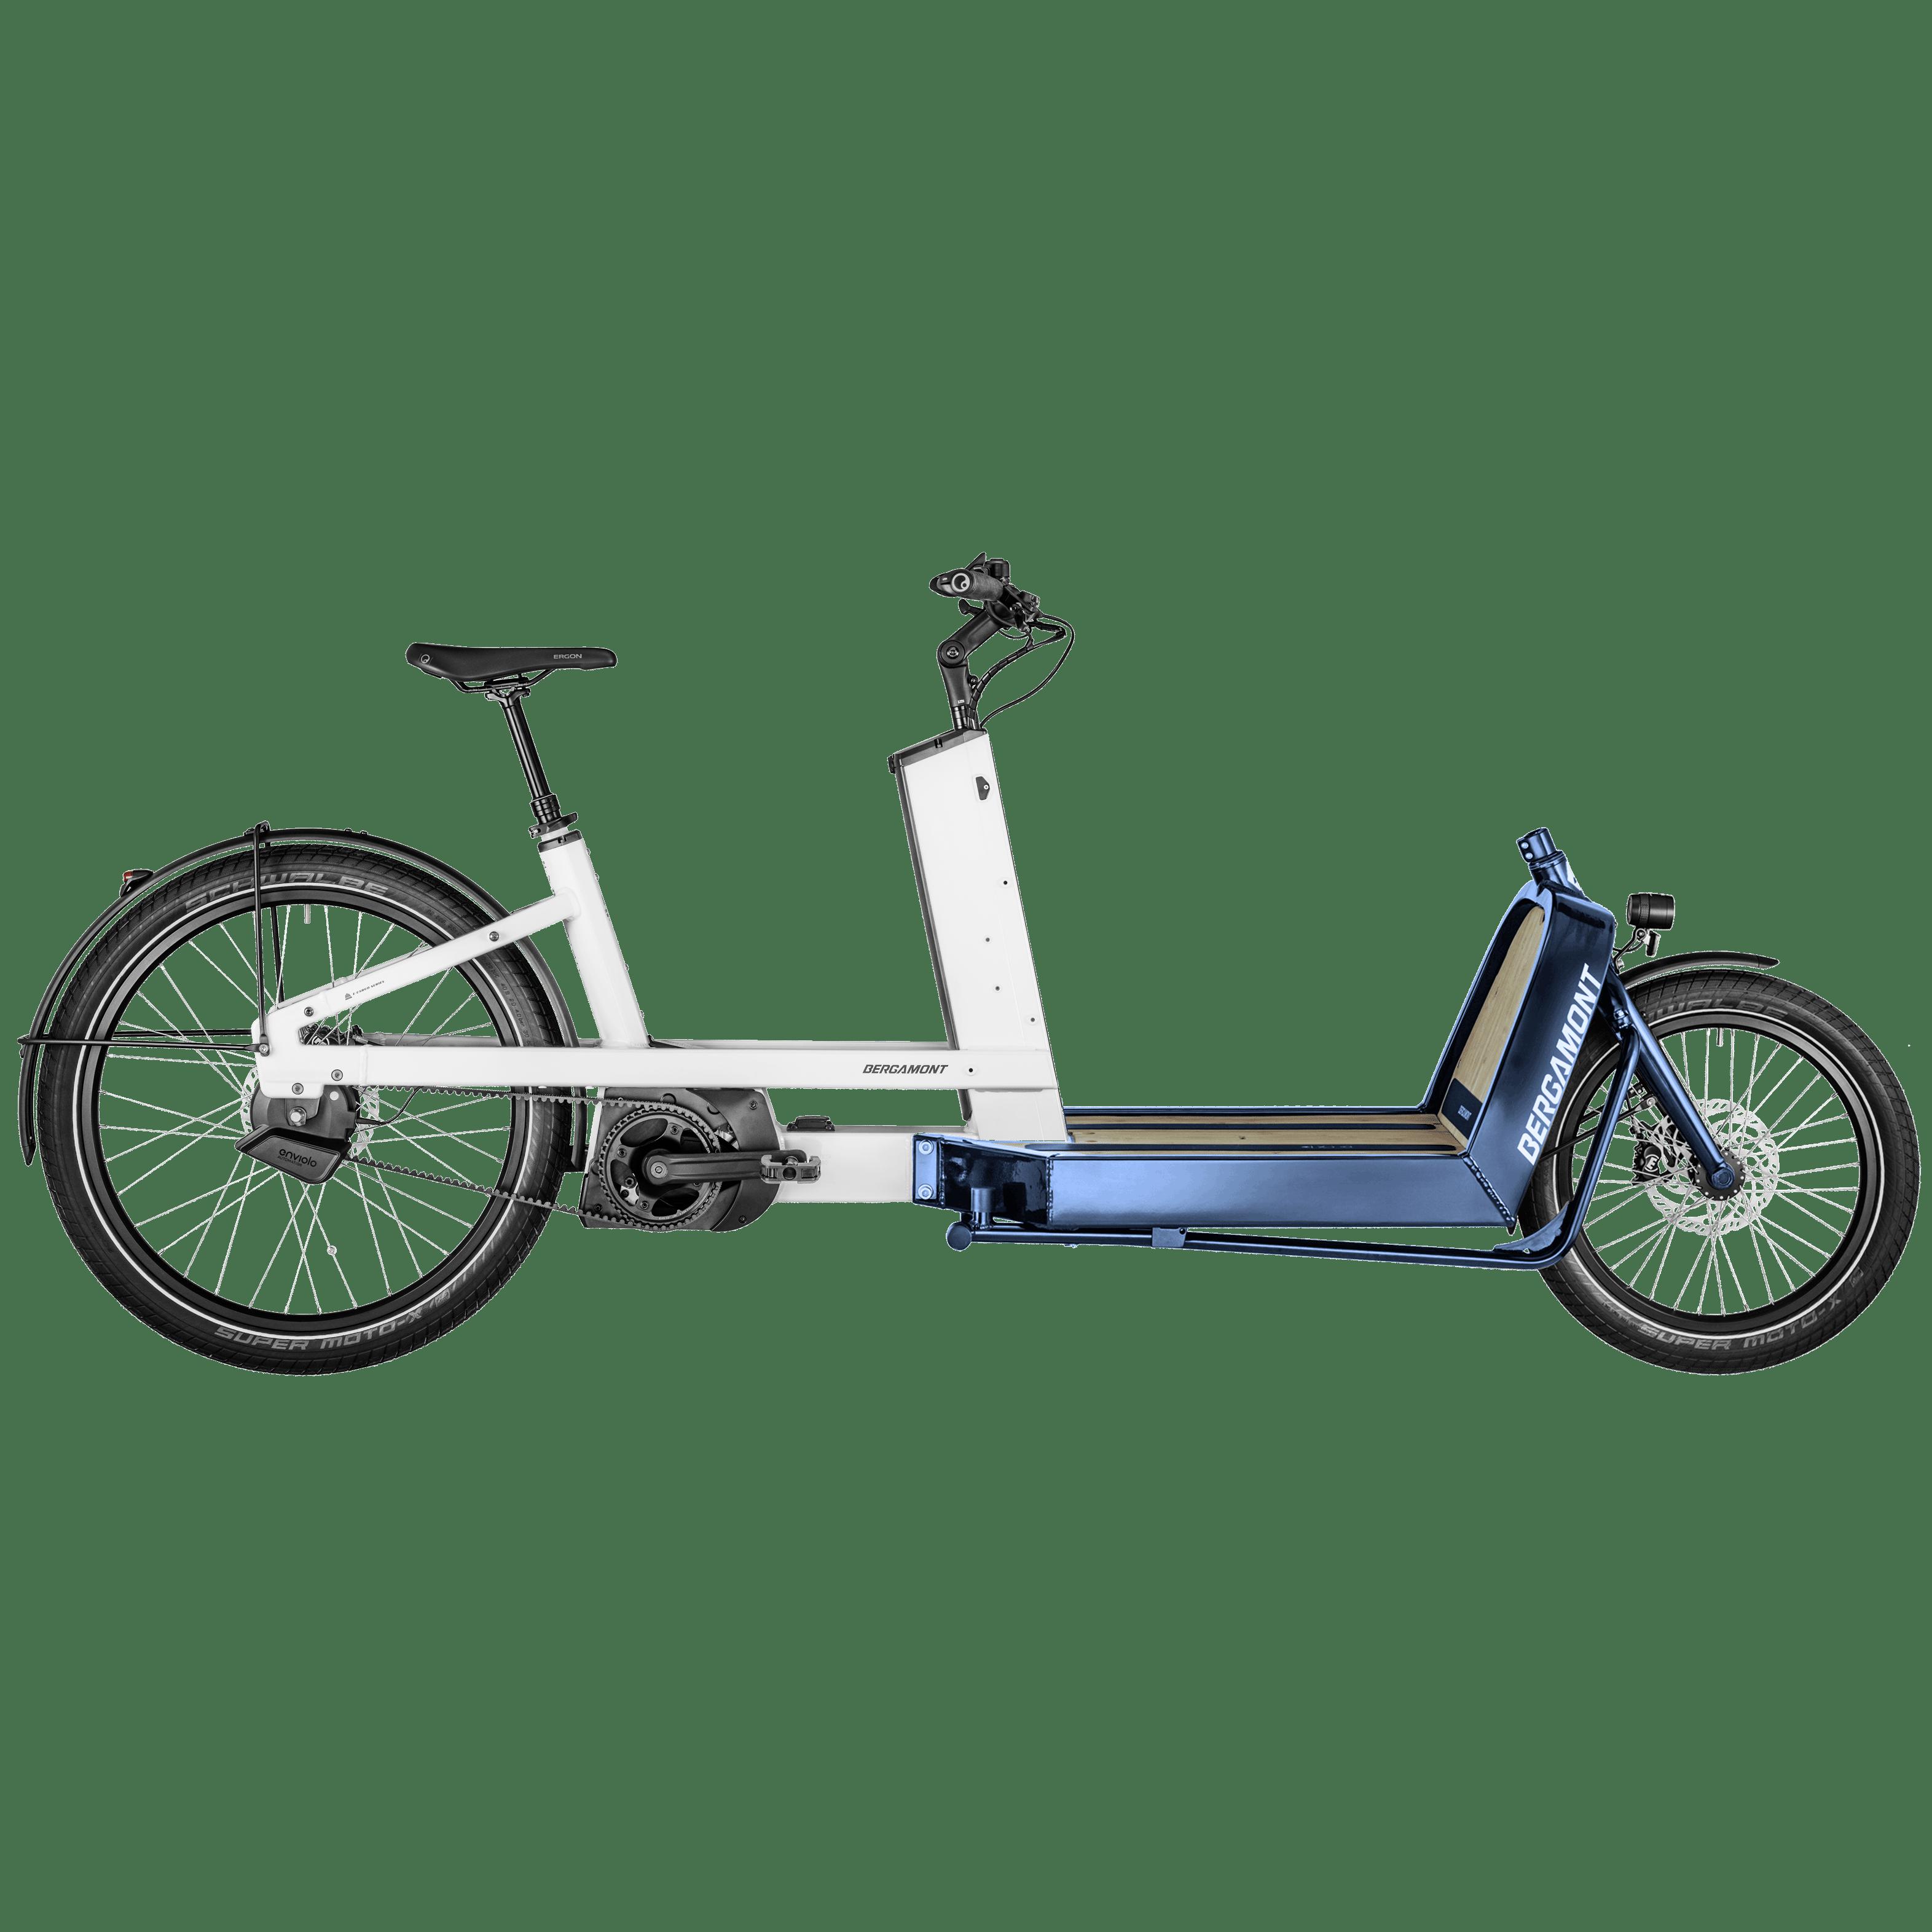 Esprit vélo BERGAMONT E-CARGOVILLE LJ ELITE